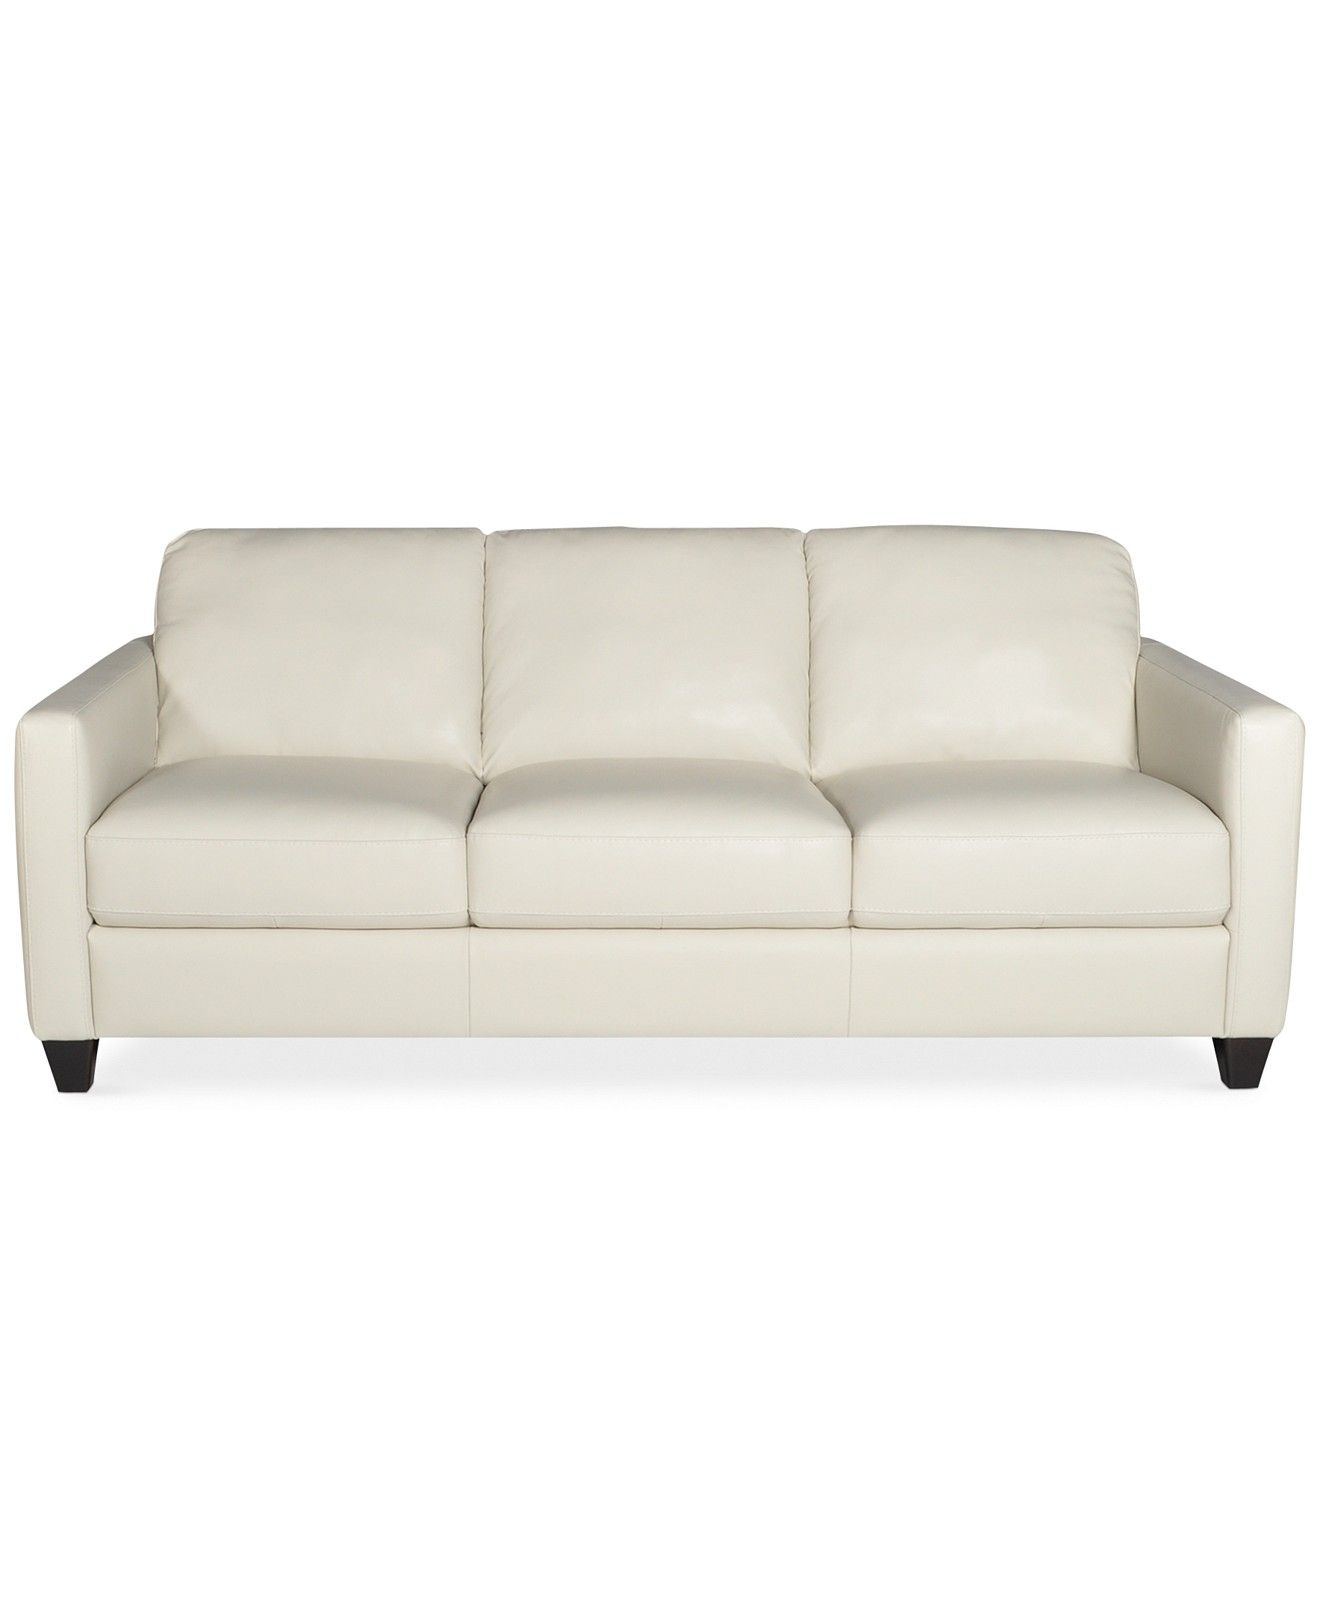 Emilia Leather Sofa Couches & Sofas Furniture Macy s